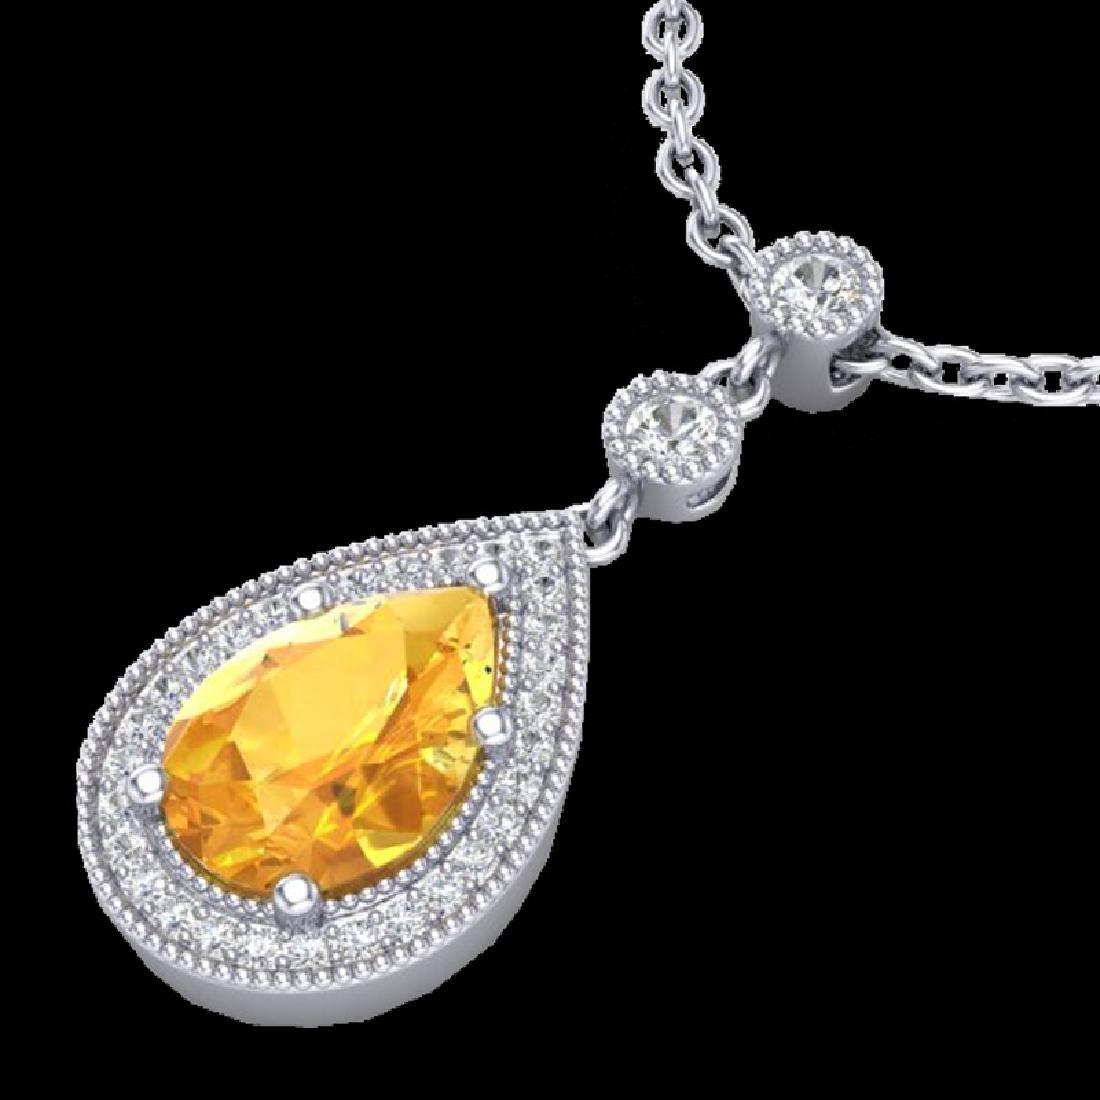 2.25 CTW Citrine & Micro Pave VS/SI Diamond Necklace